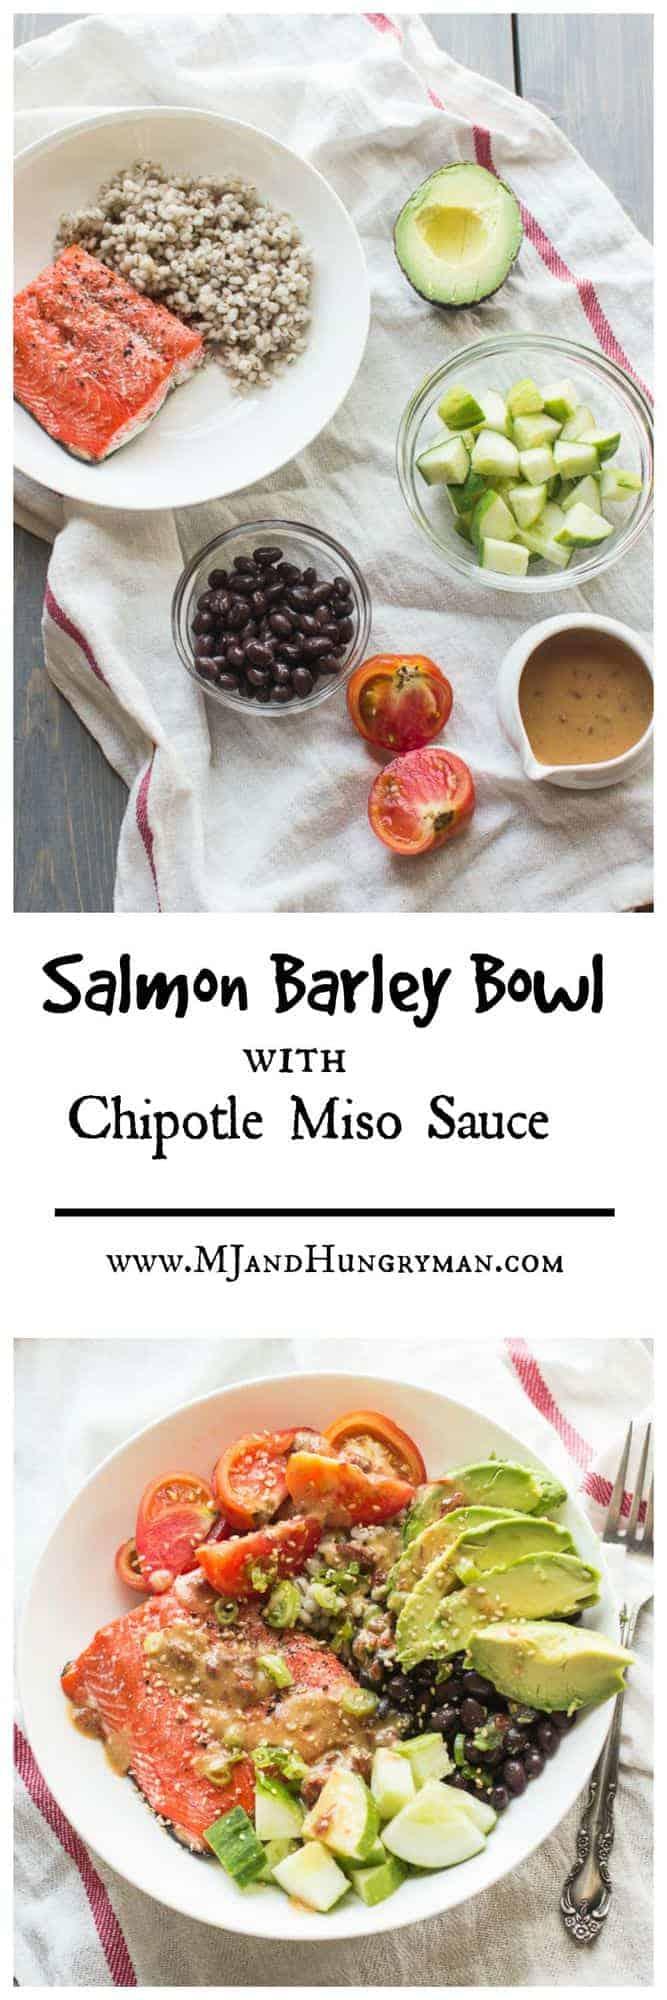 Salmon Barley Bowl with Chipotle Miso Sauce